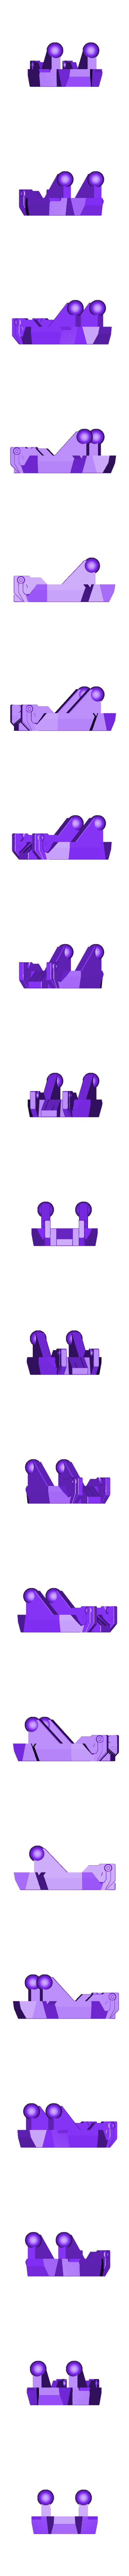 20_Drag_Body9_Abdomen_BLACK.stl Download STL file ARTICULATED DRAGONLORD (not Dragonzord) - NO SUPPORT • 3D printer model, Toymakr3D